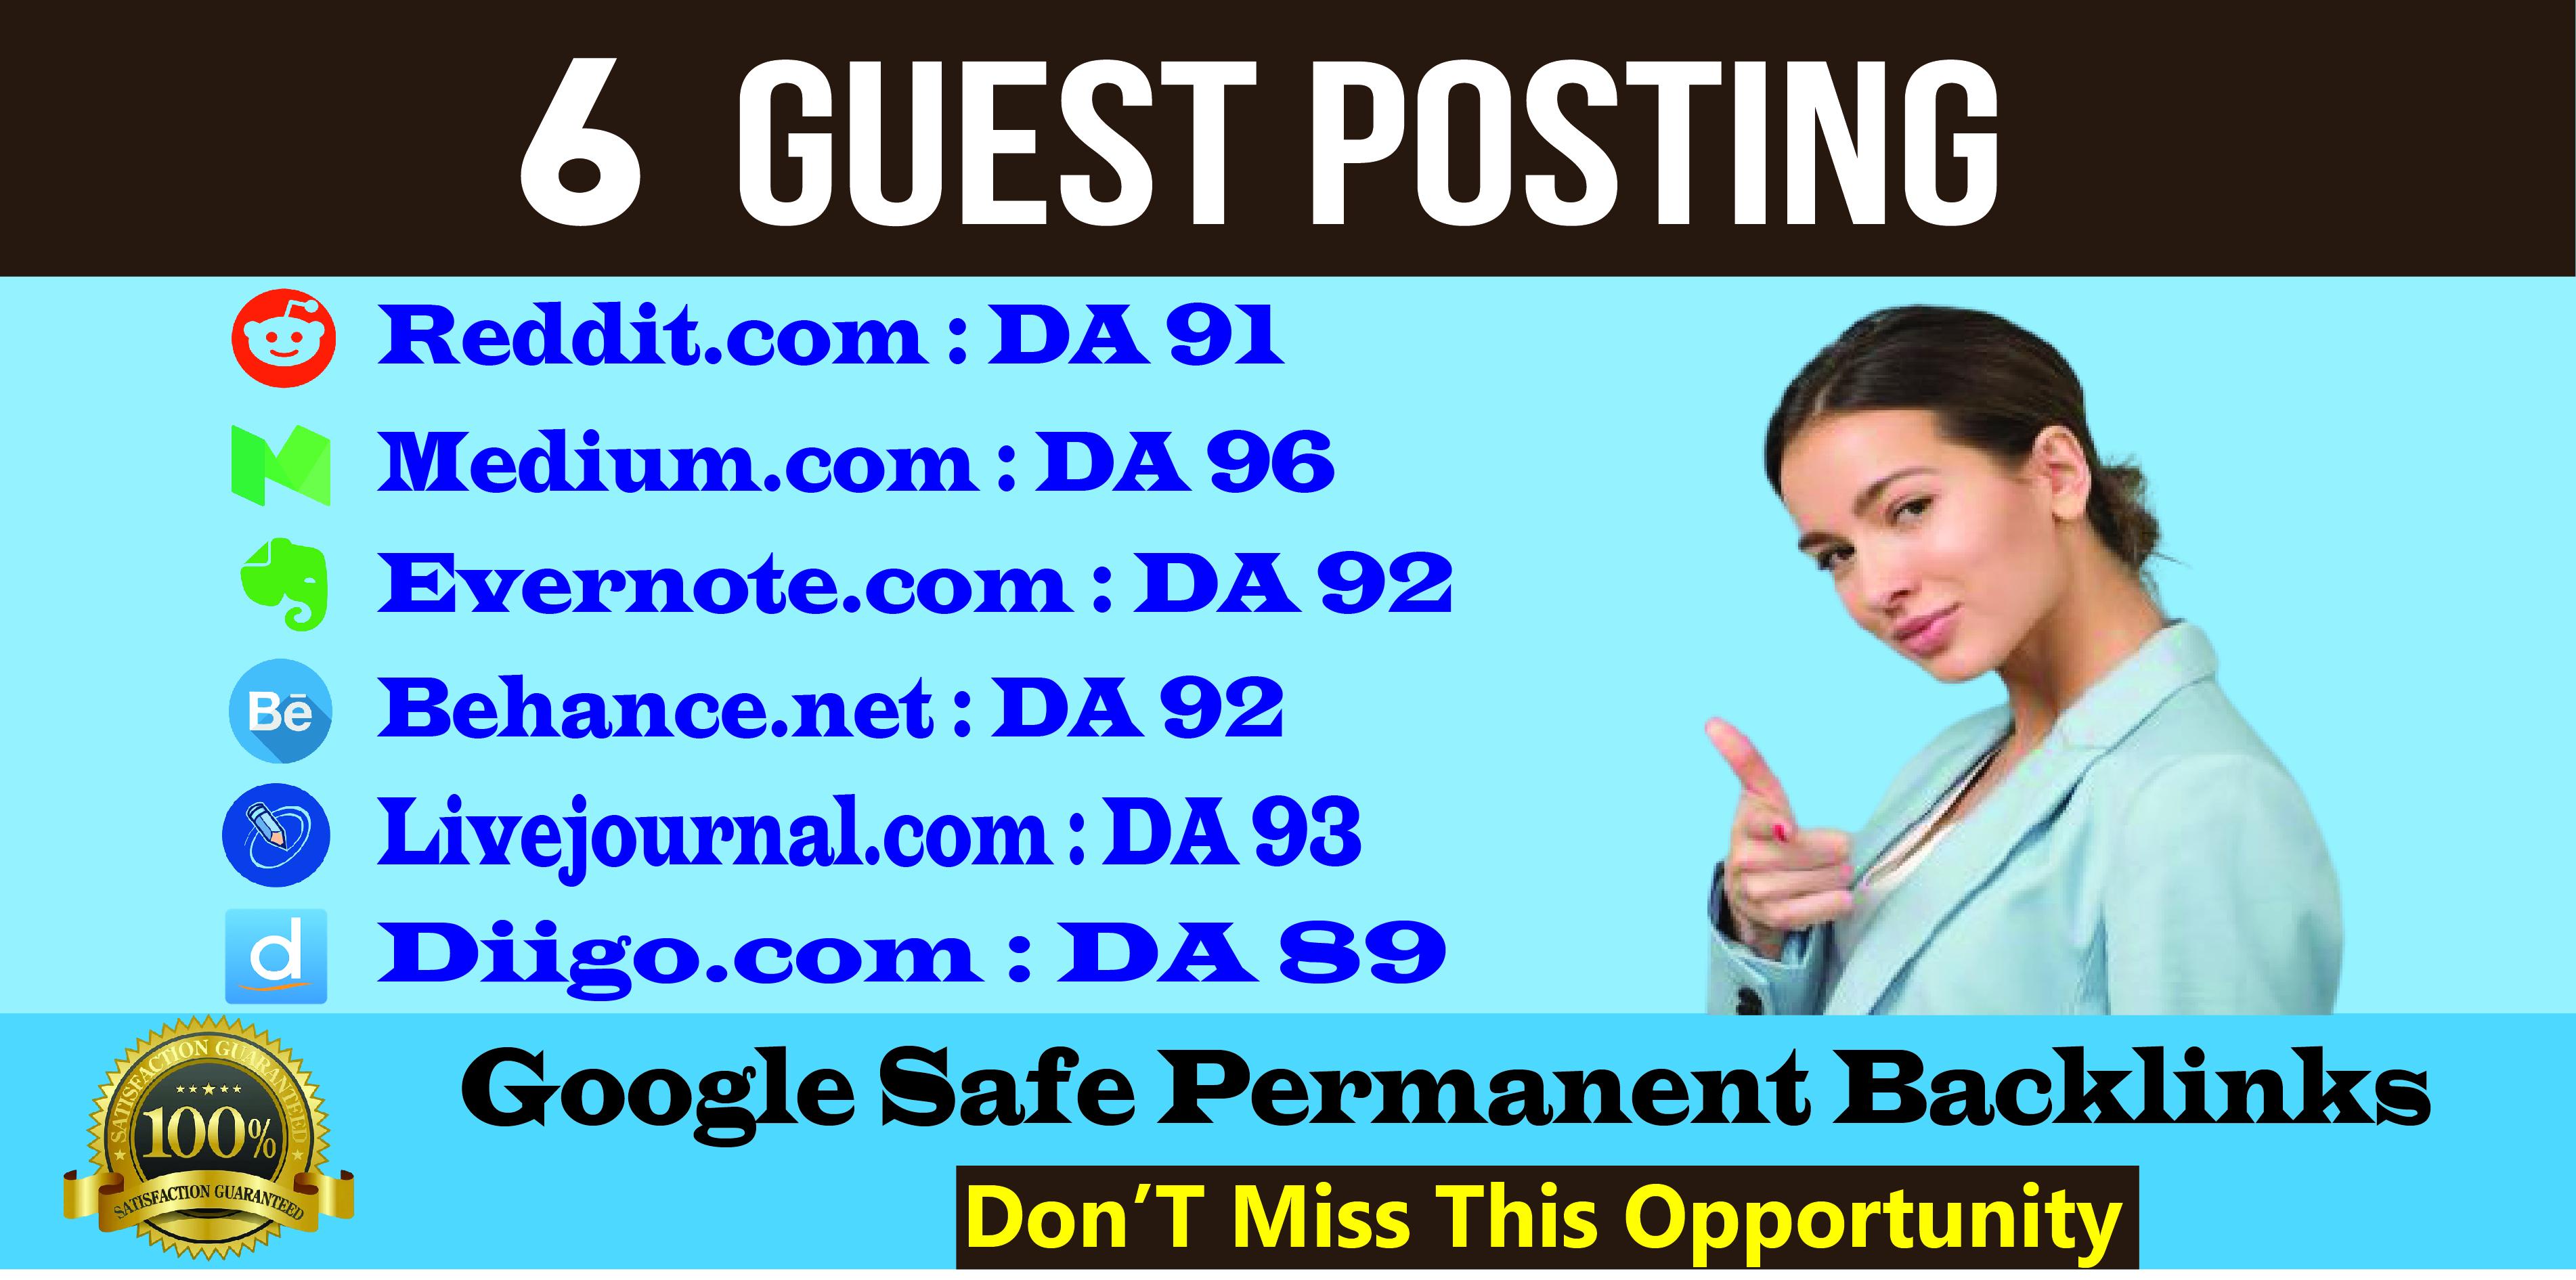 Build 6 SEO Backlinks Through High DA Guest Posts High Authority Link Building